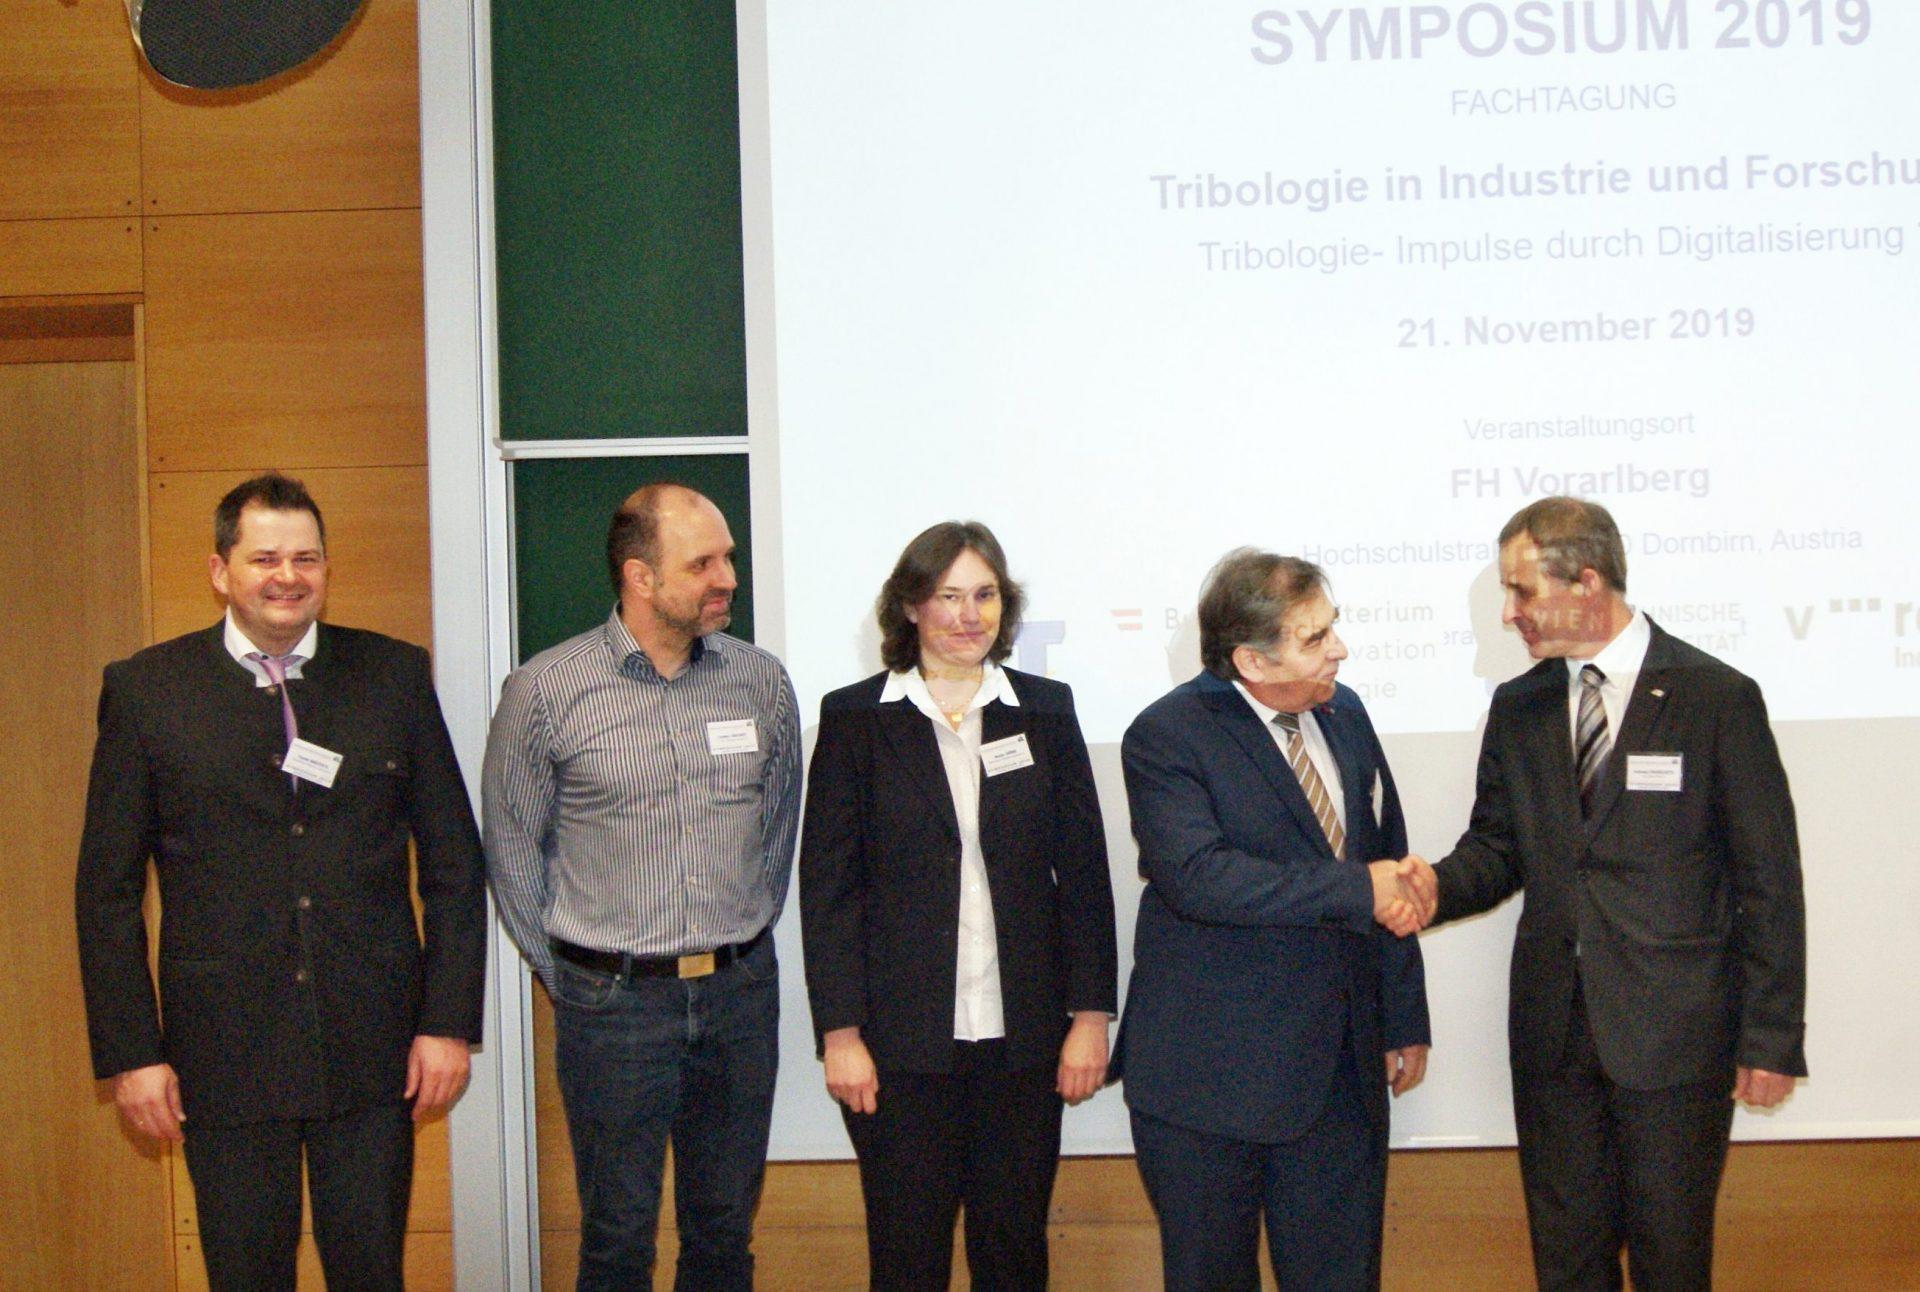 Handover of office: Prof. Pauschitz succeeds Prof. Franek